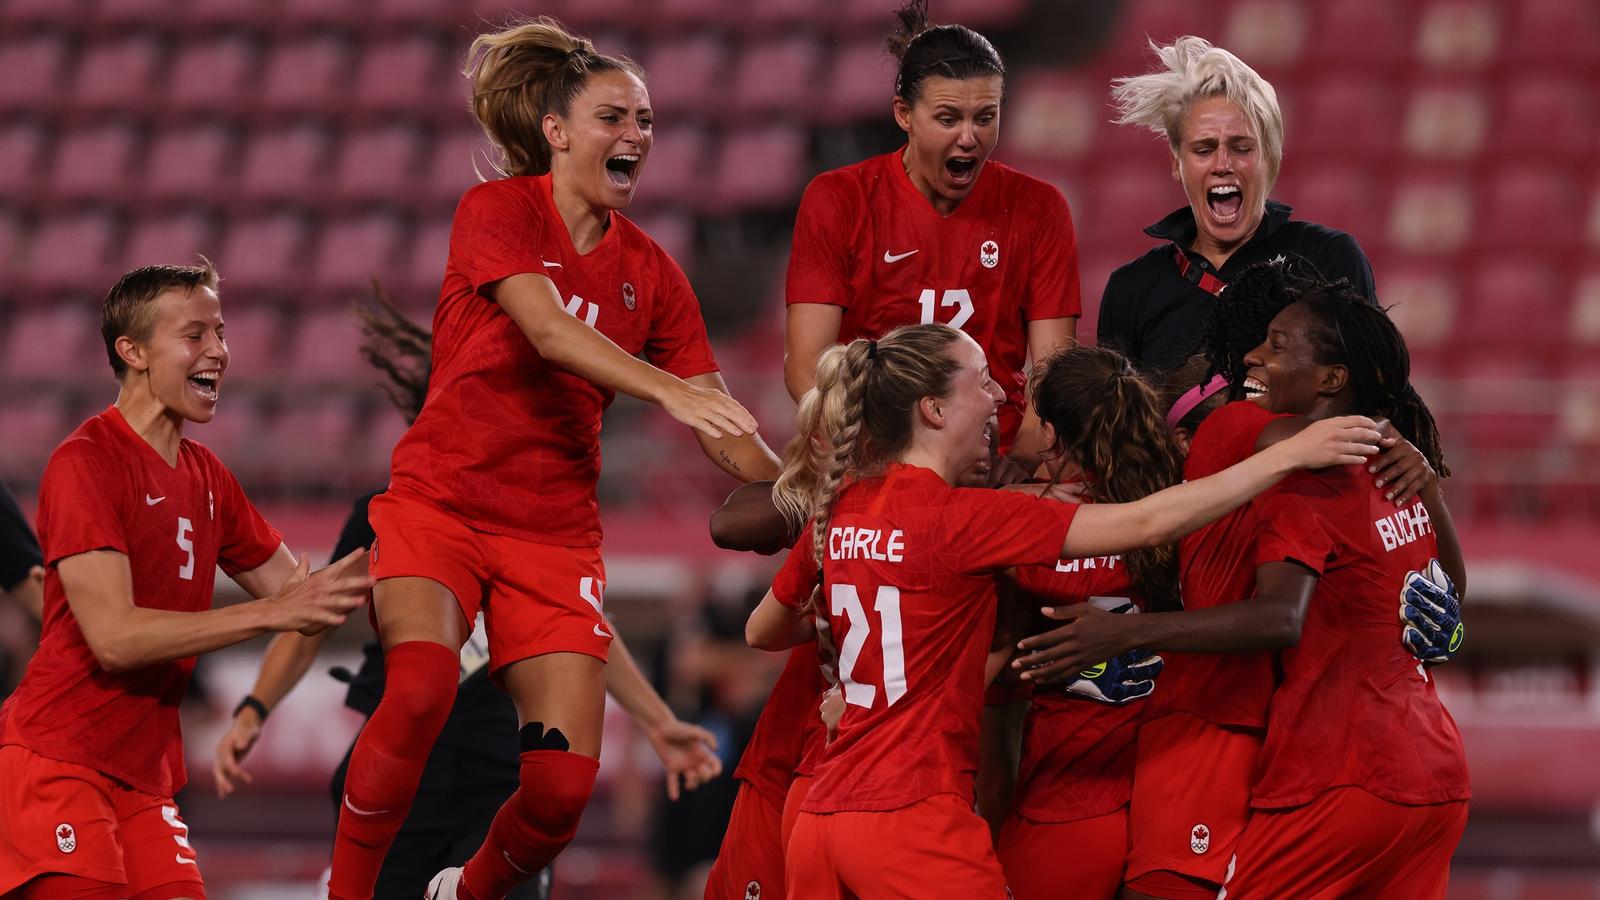 Tokyo 2020: Sweden & Canada ask for soccer final delay